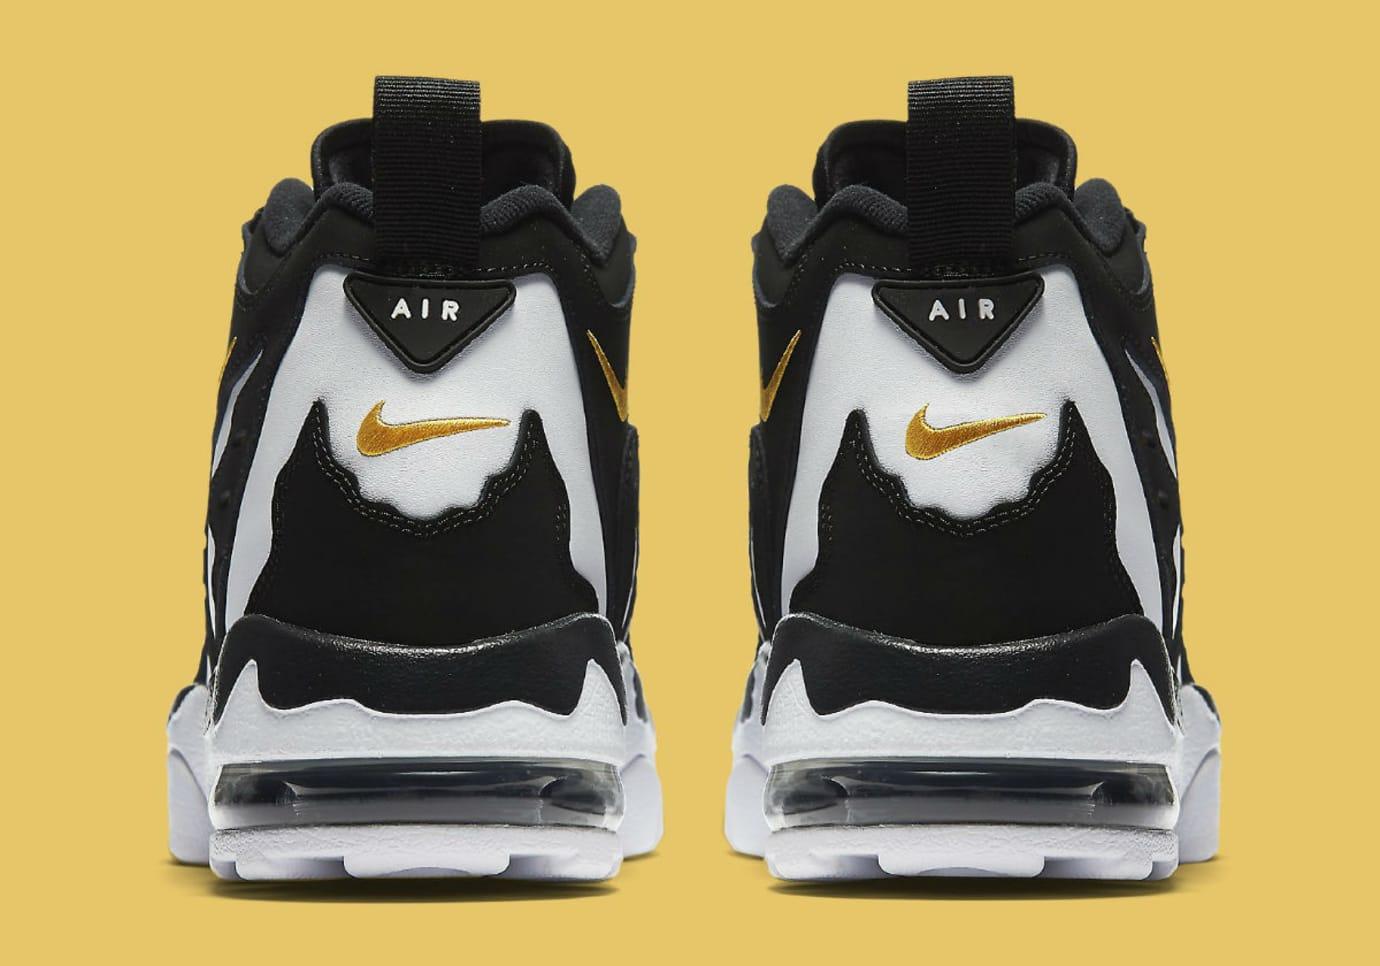 Nike Air DT Max 96 Black White Release Date 316408-003 Heel